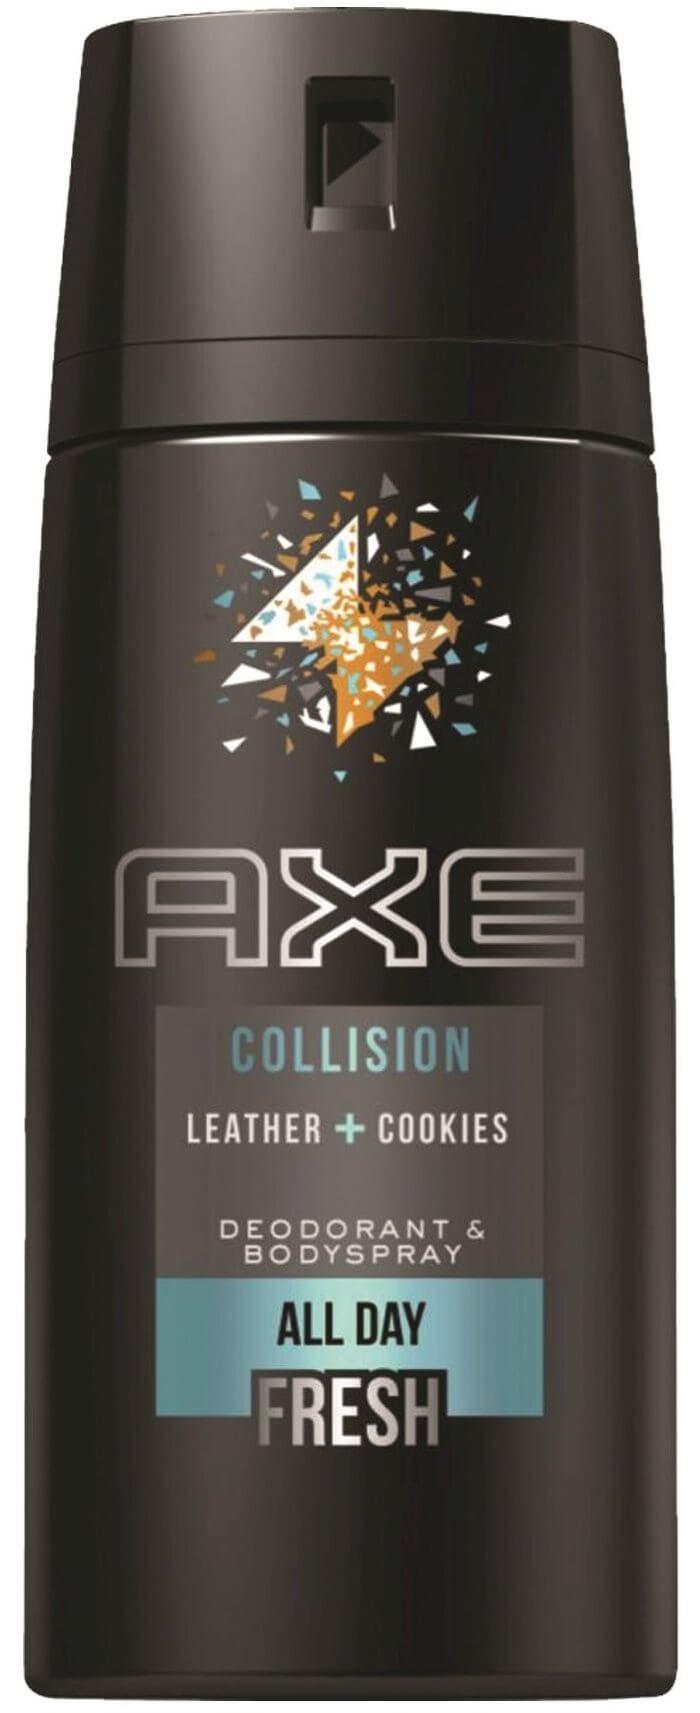 "AXE | אקס דאודורנט ספריי גוף לגבר קוליז'ן 150 מ""ל תמונה של"